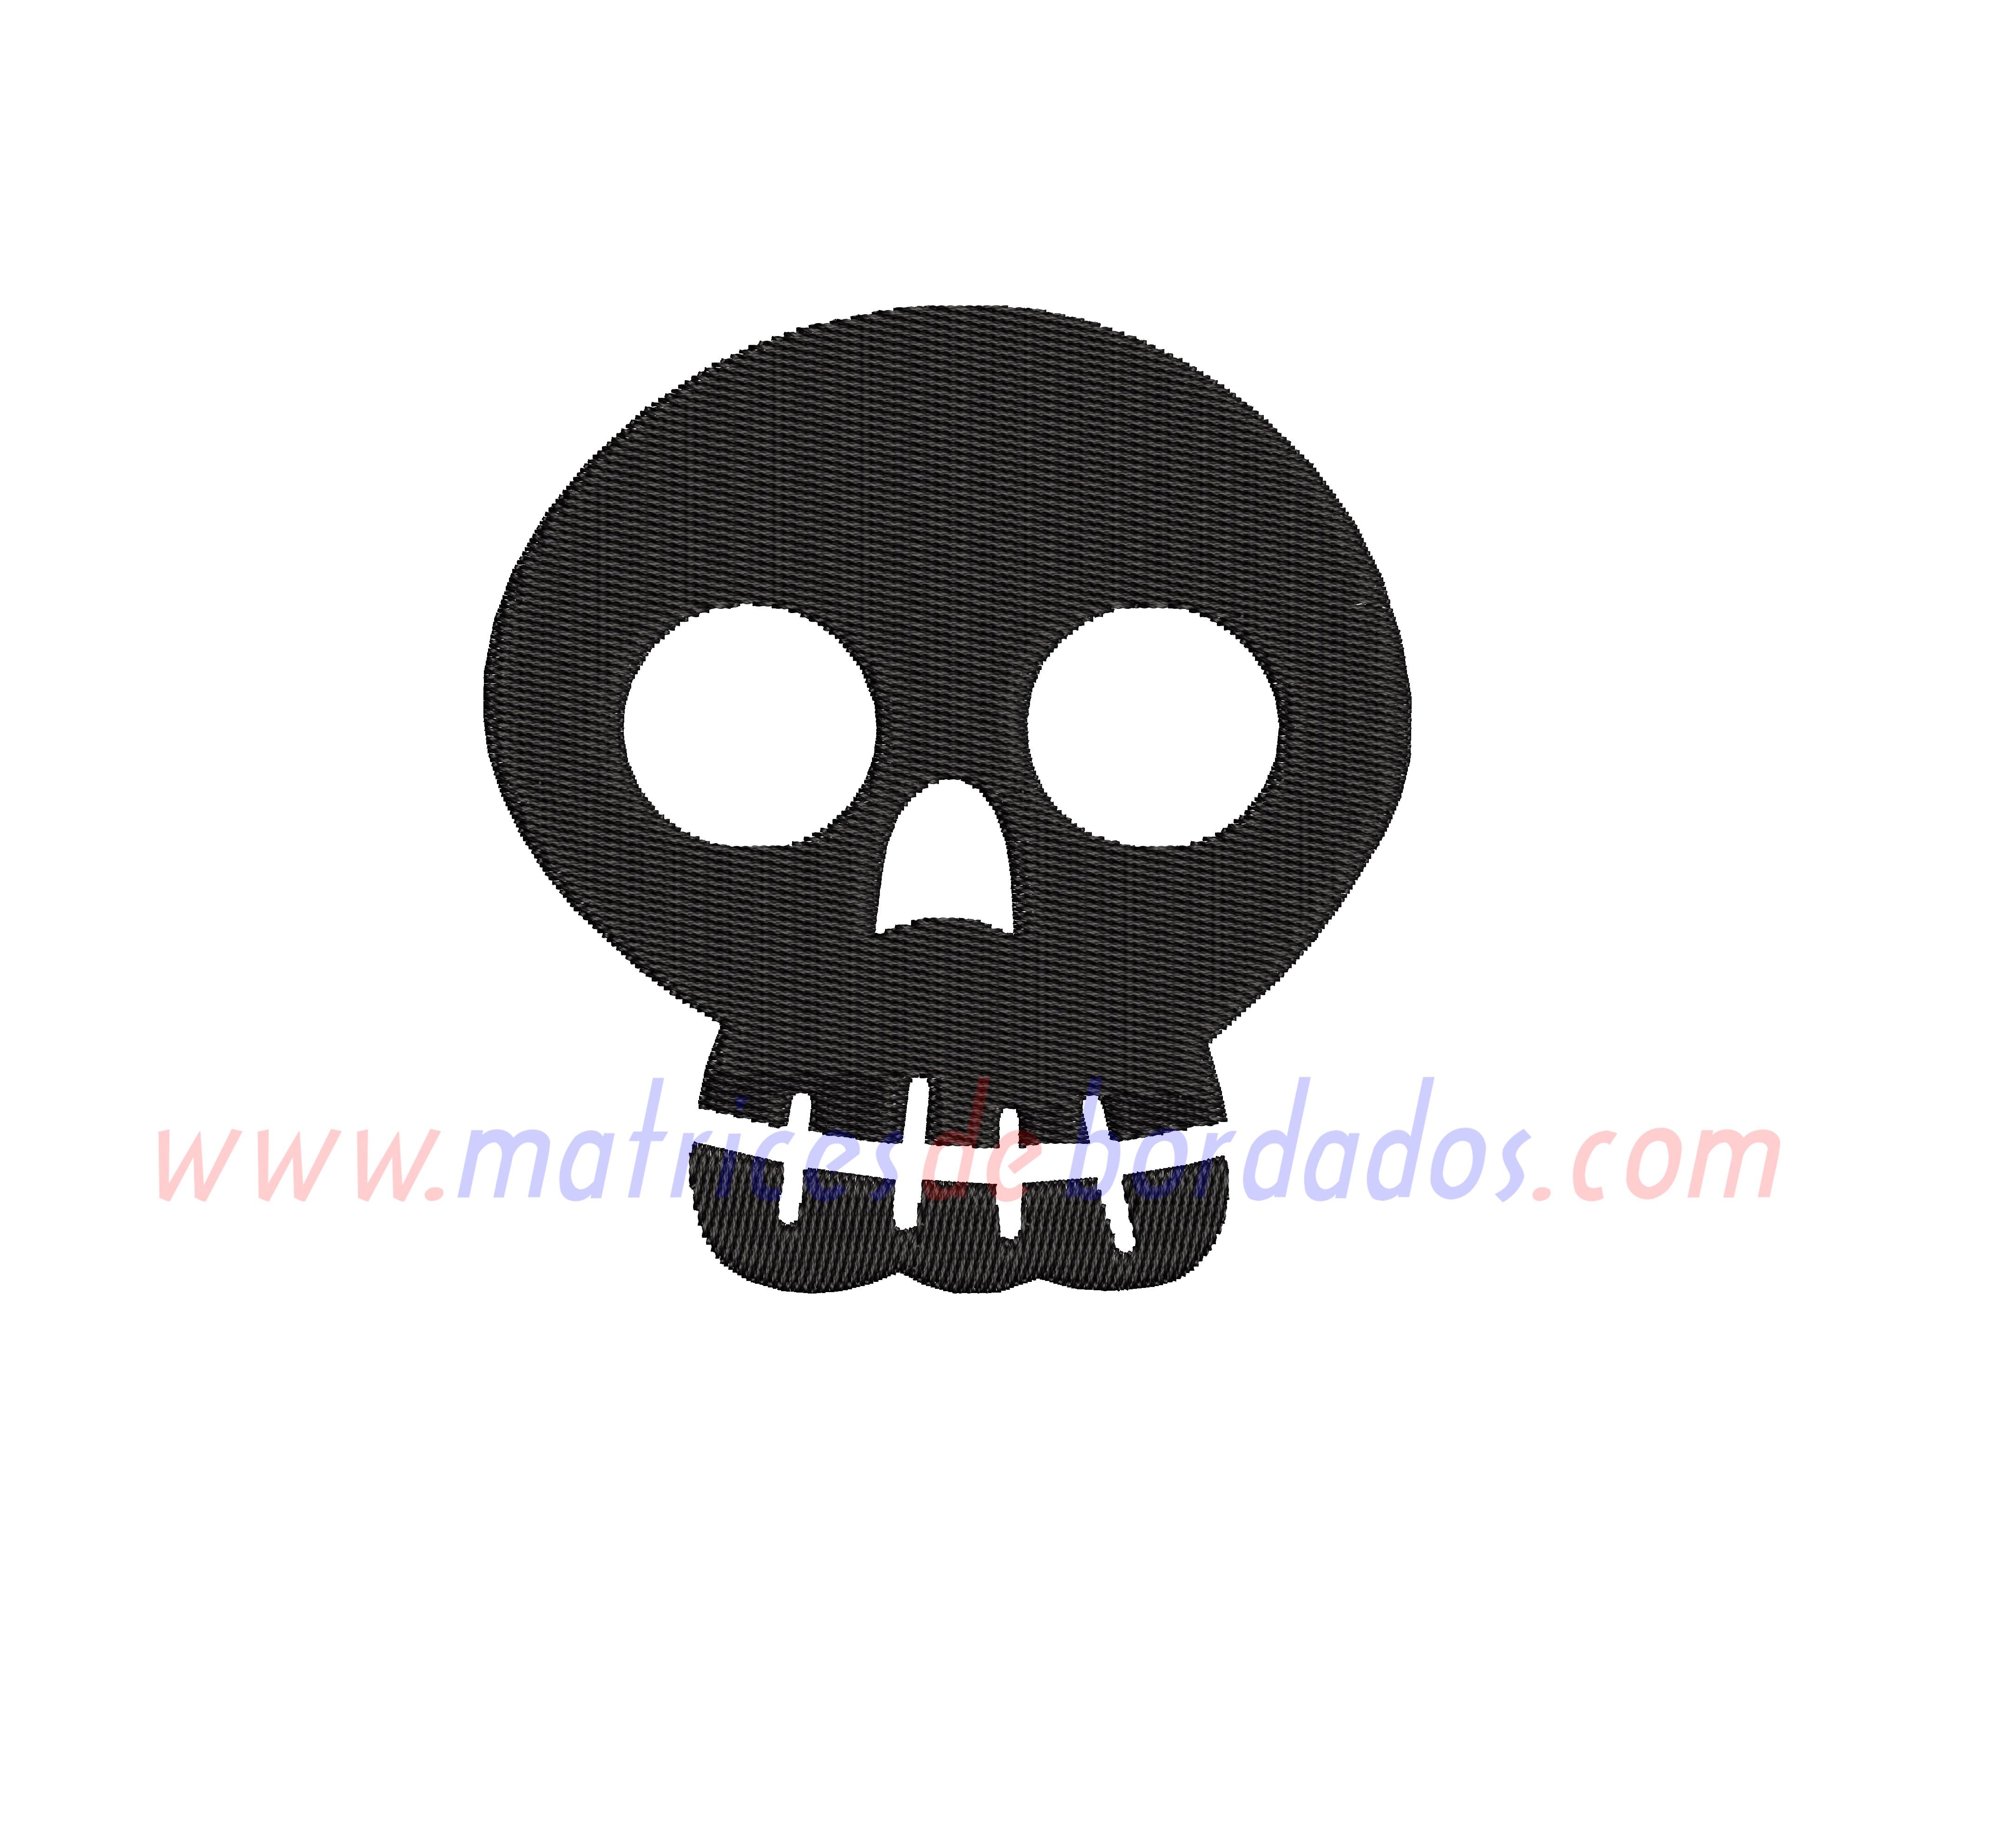 DJ87QA - Cara de Calavera Halloween